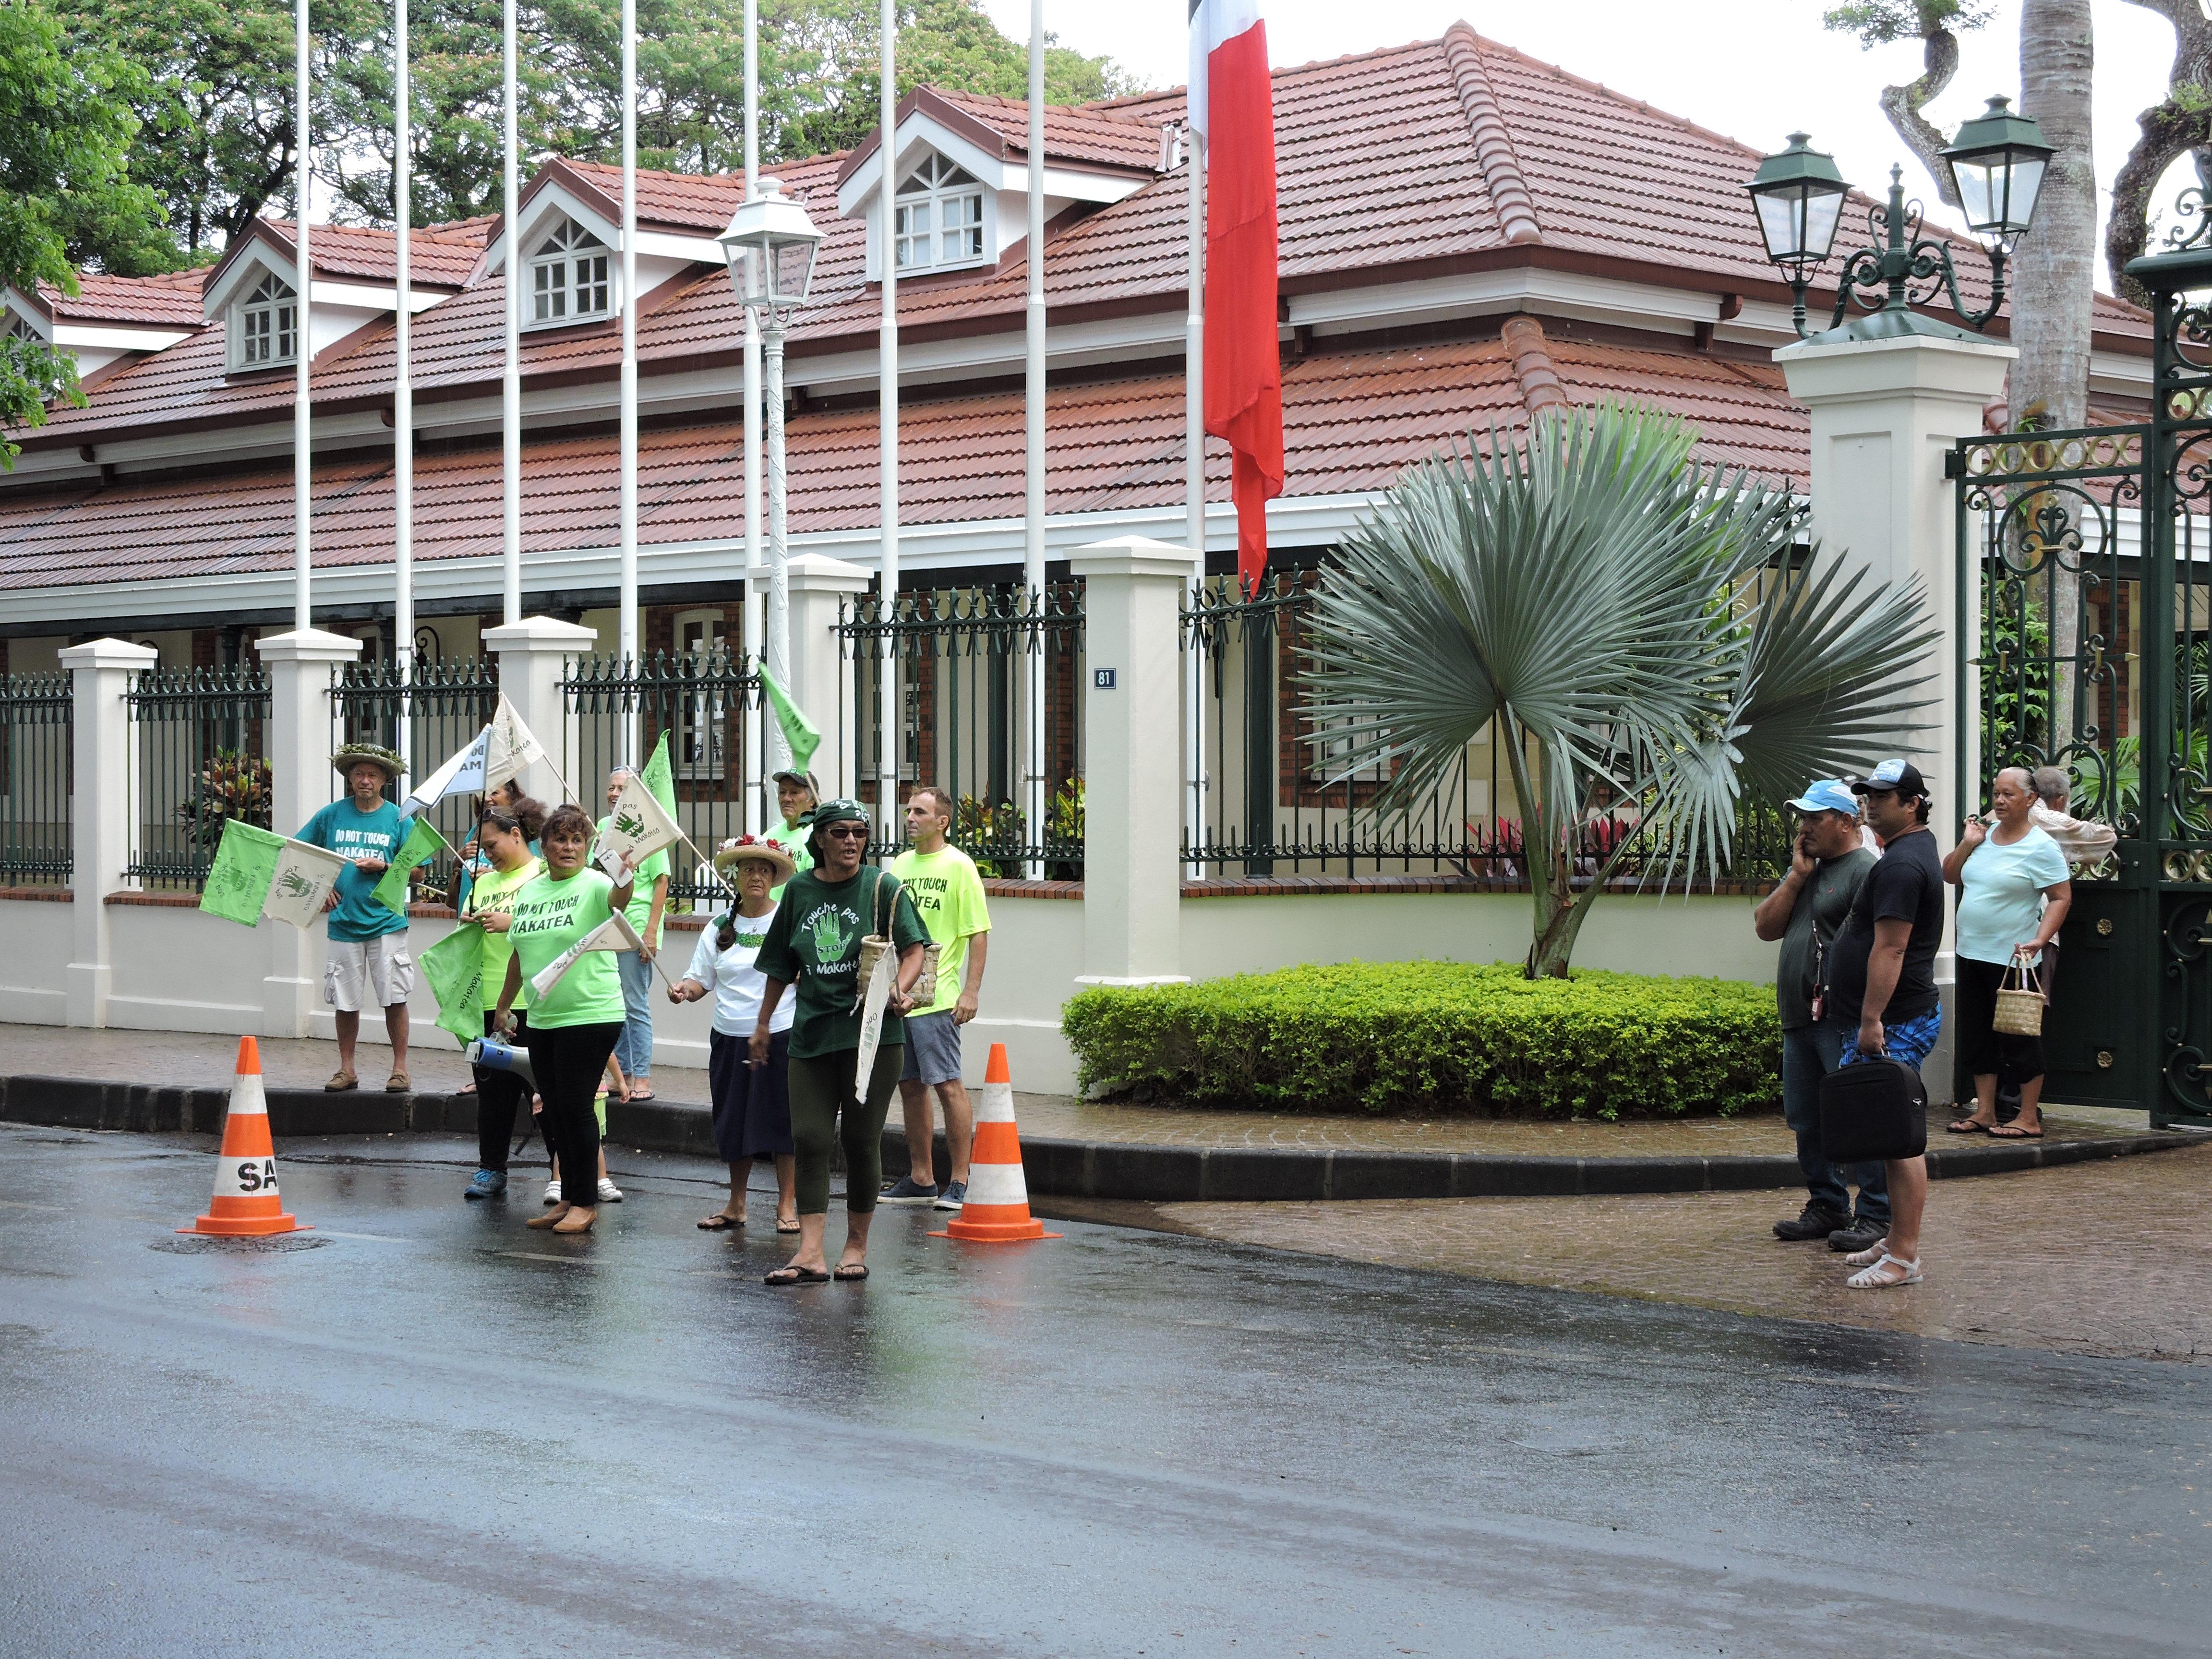 Les associations Te Fatu fenua no Makatea et Te Rupe no Makatea manifesteront jusqu'à samedi devant la présidence.